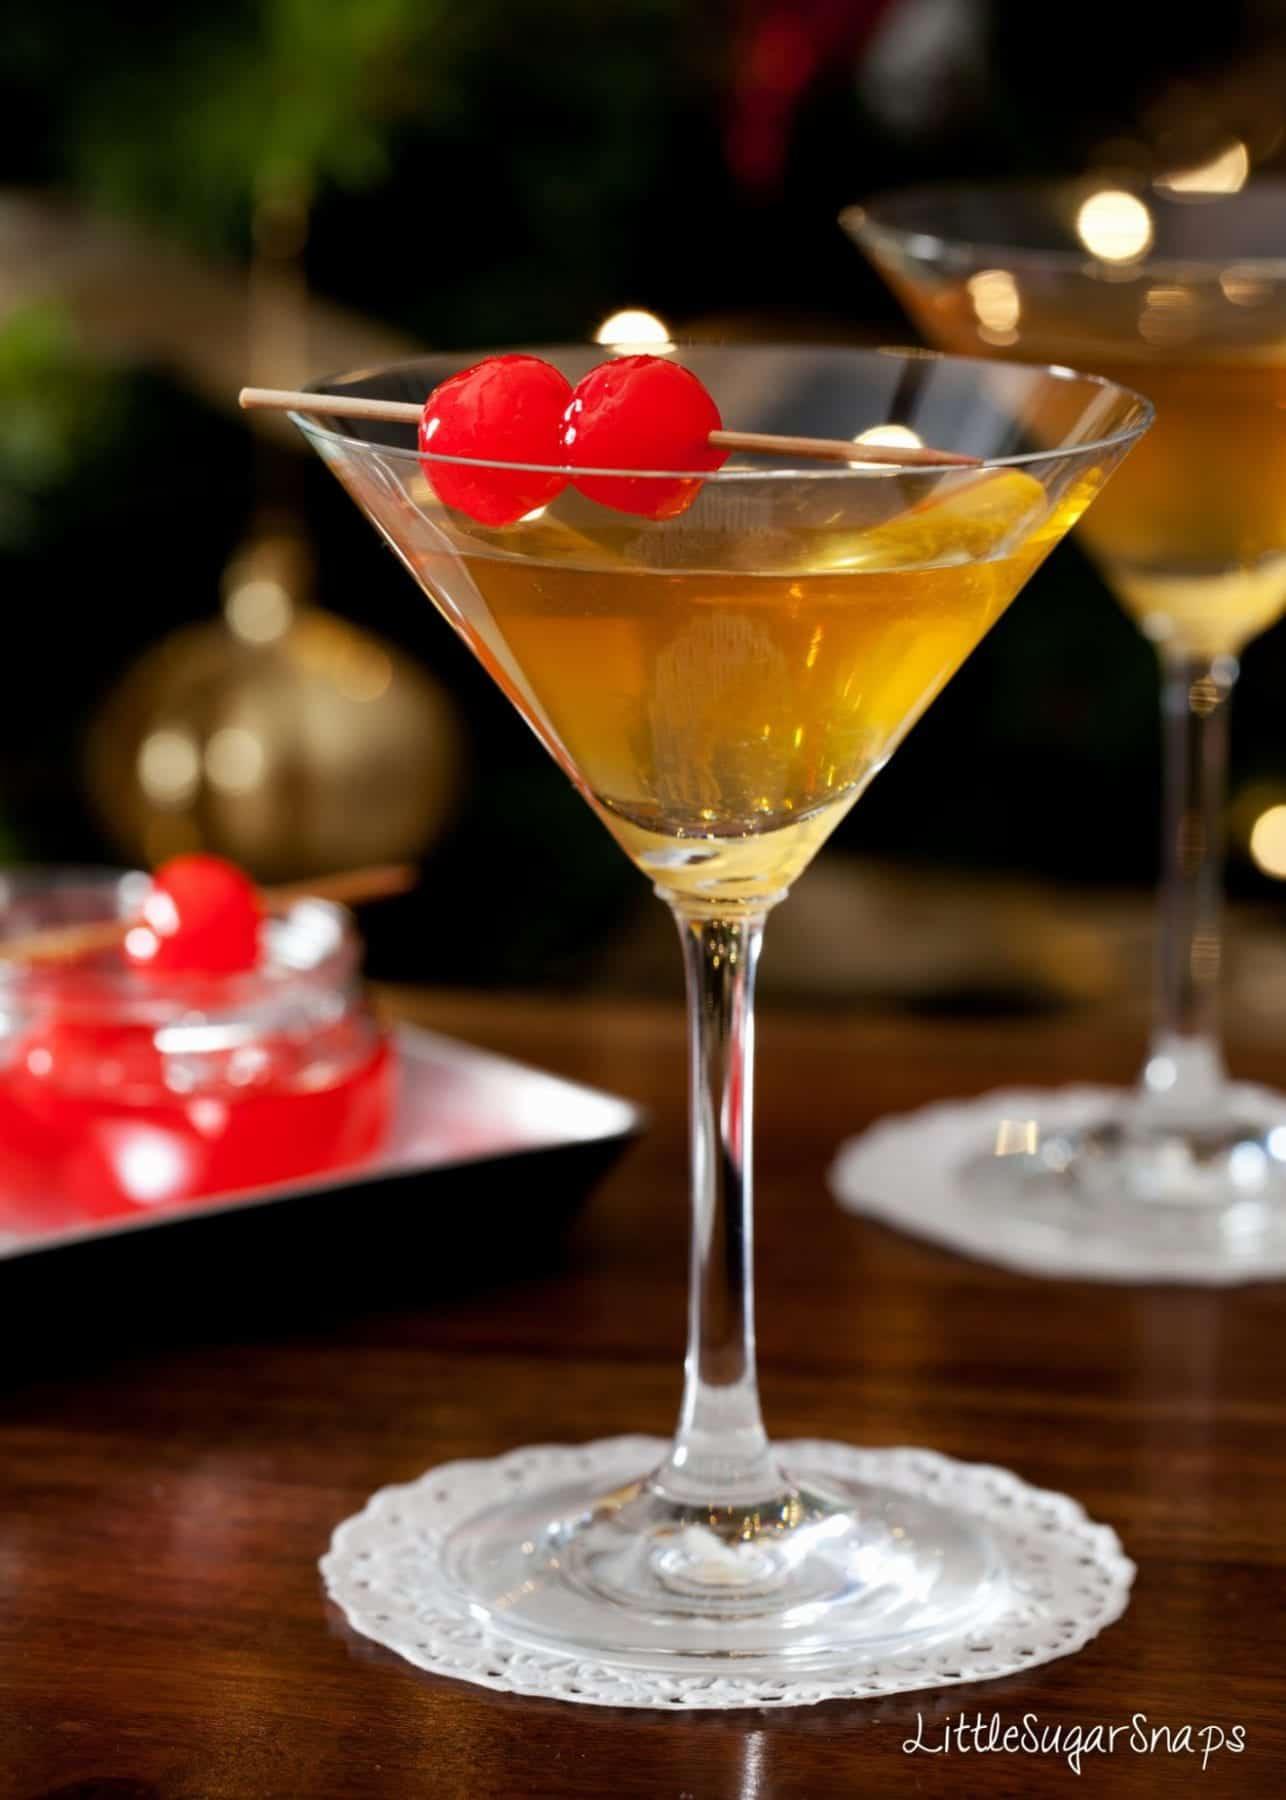 McMerry Martini